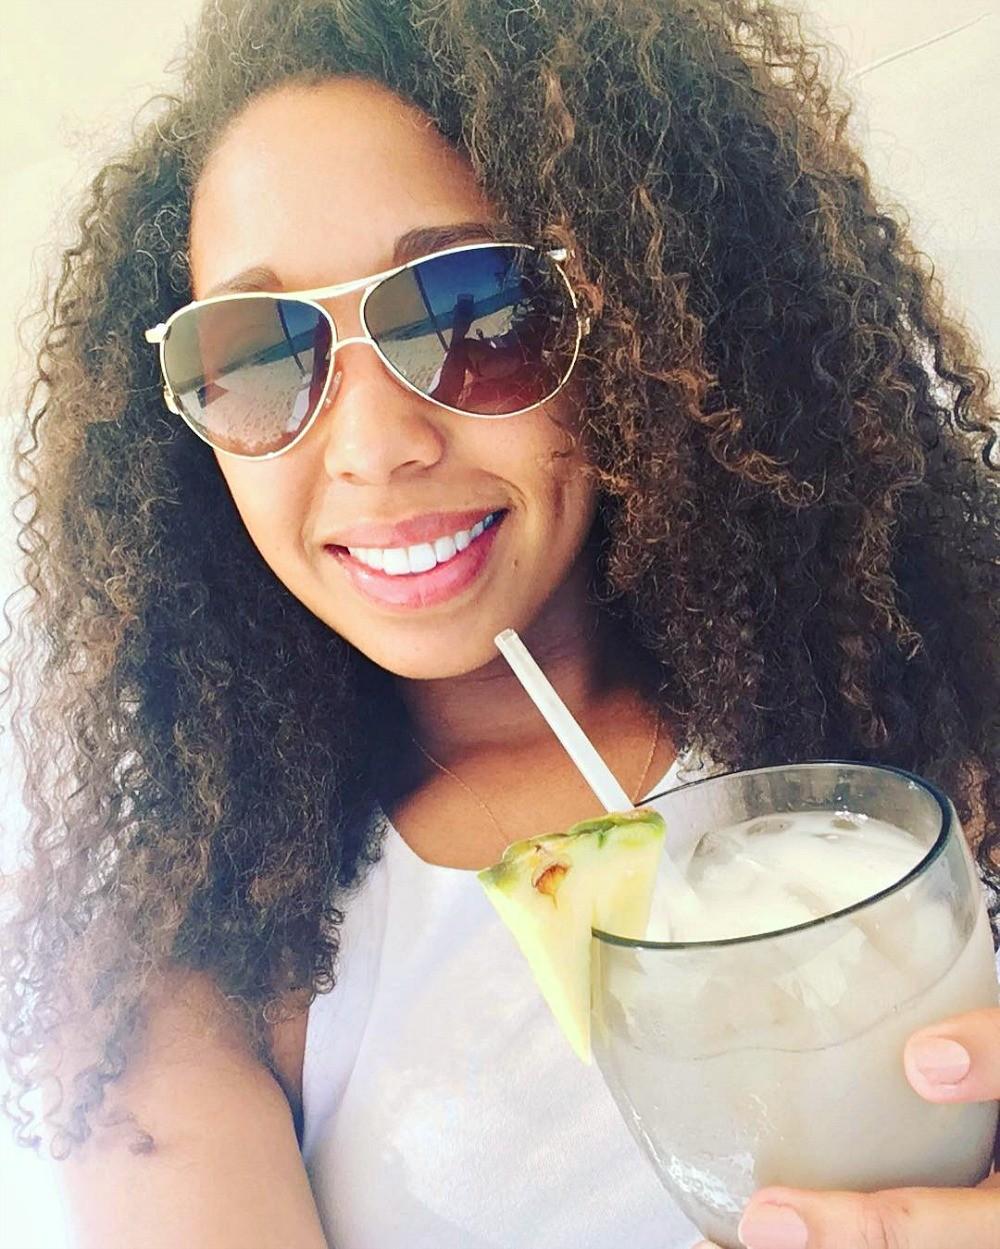 Enjoying myself on the beach with a margarita at Grand Velas Los Cabos resort